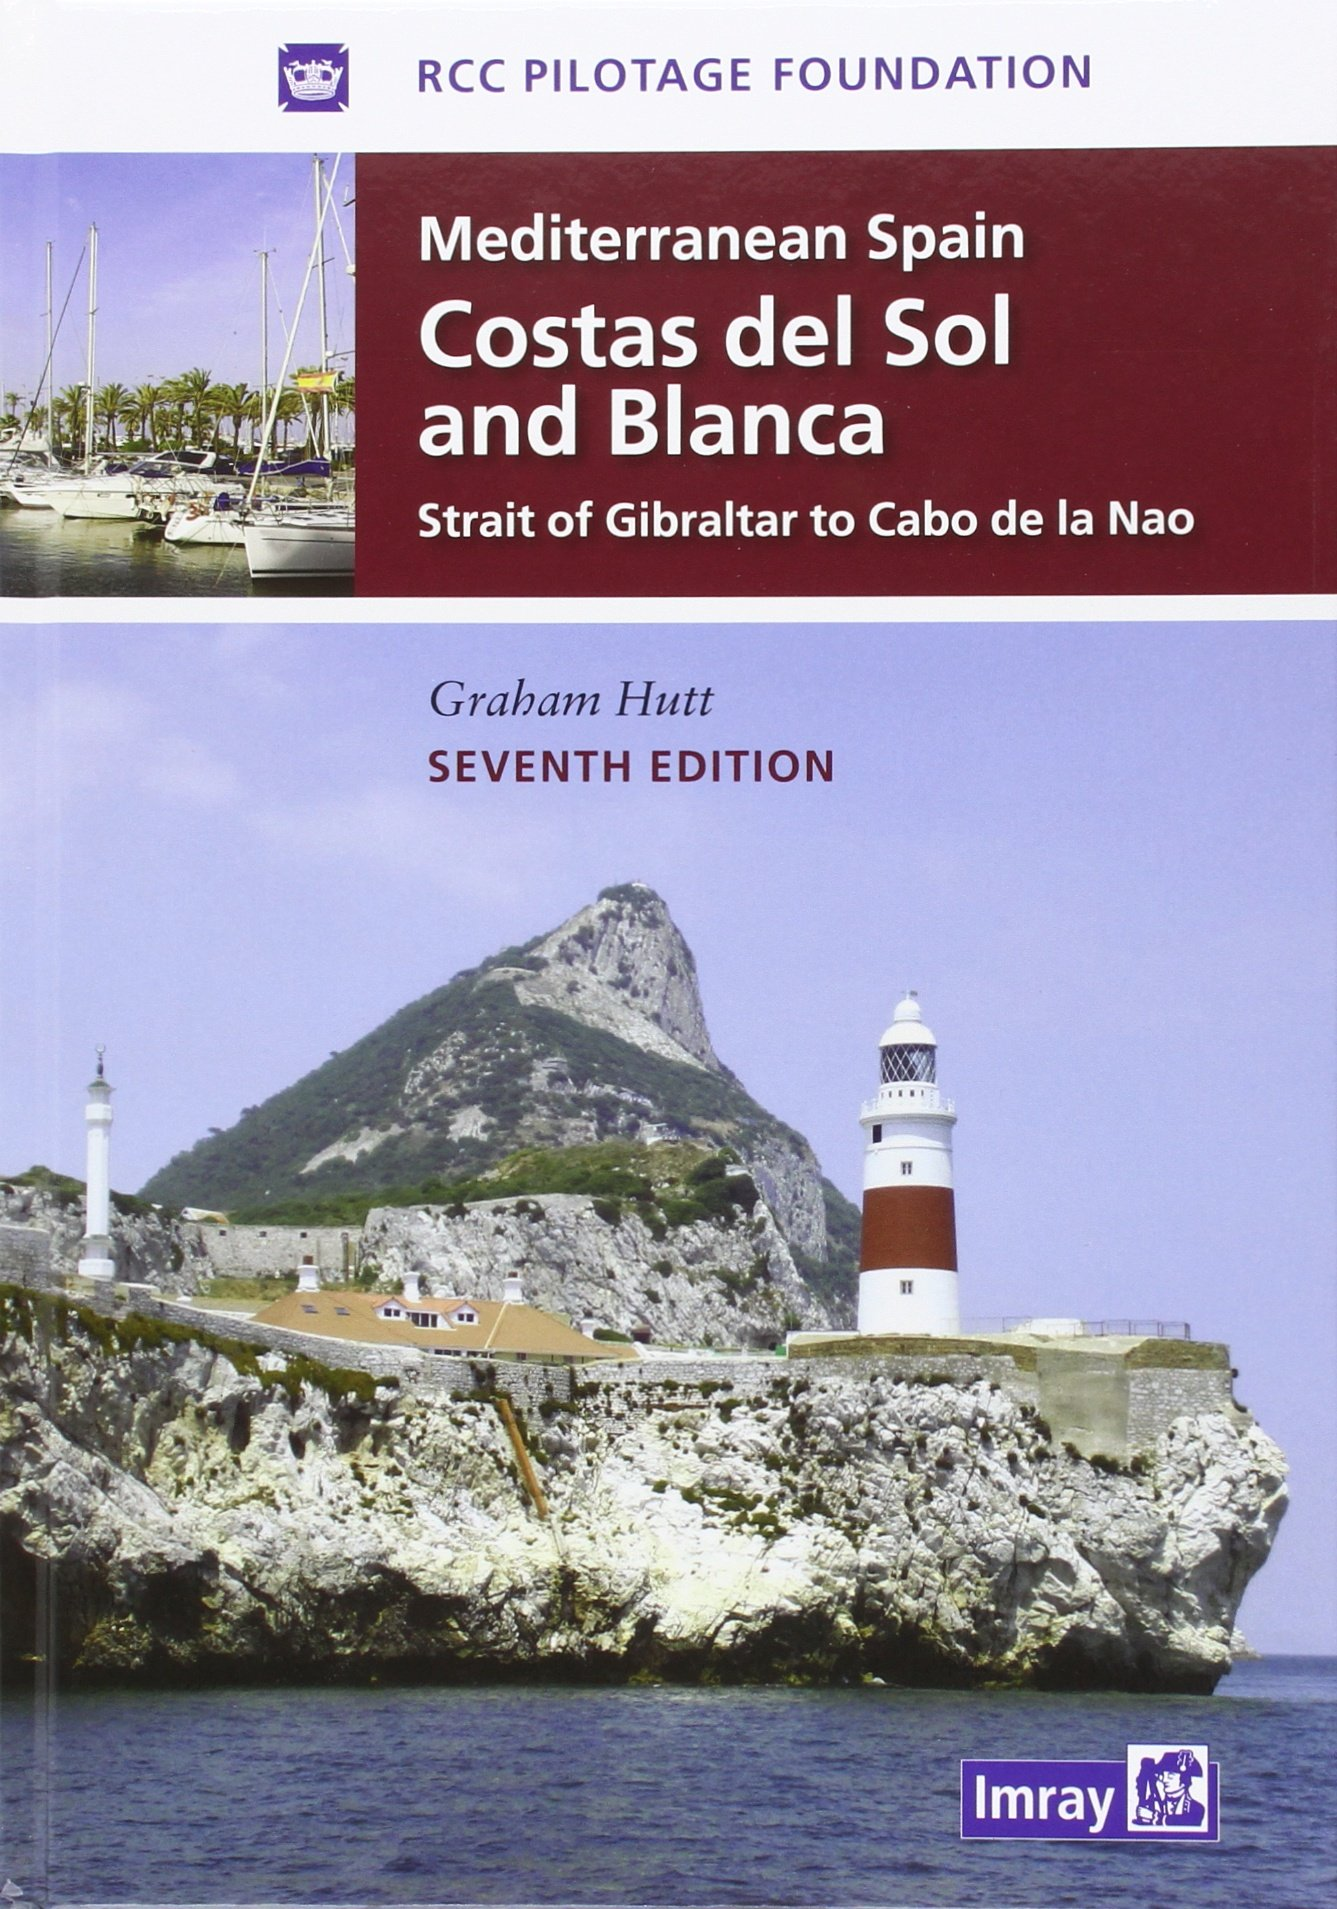 Mediterranean Spain - Costas Del Sol and Blanca: Strait of Gibraltar to Denia